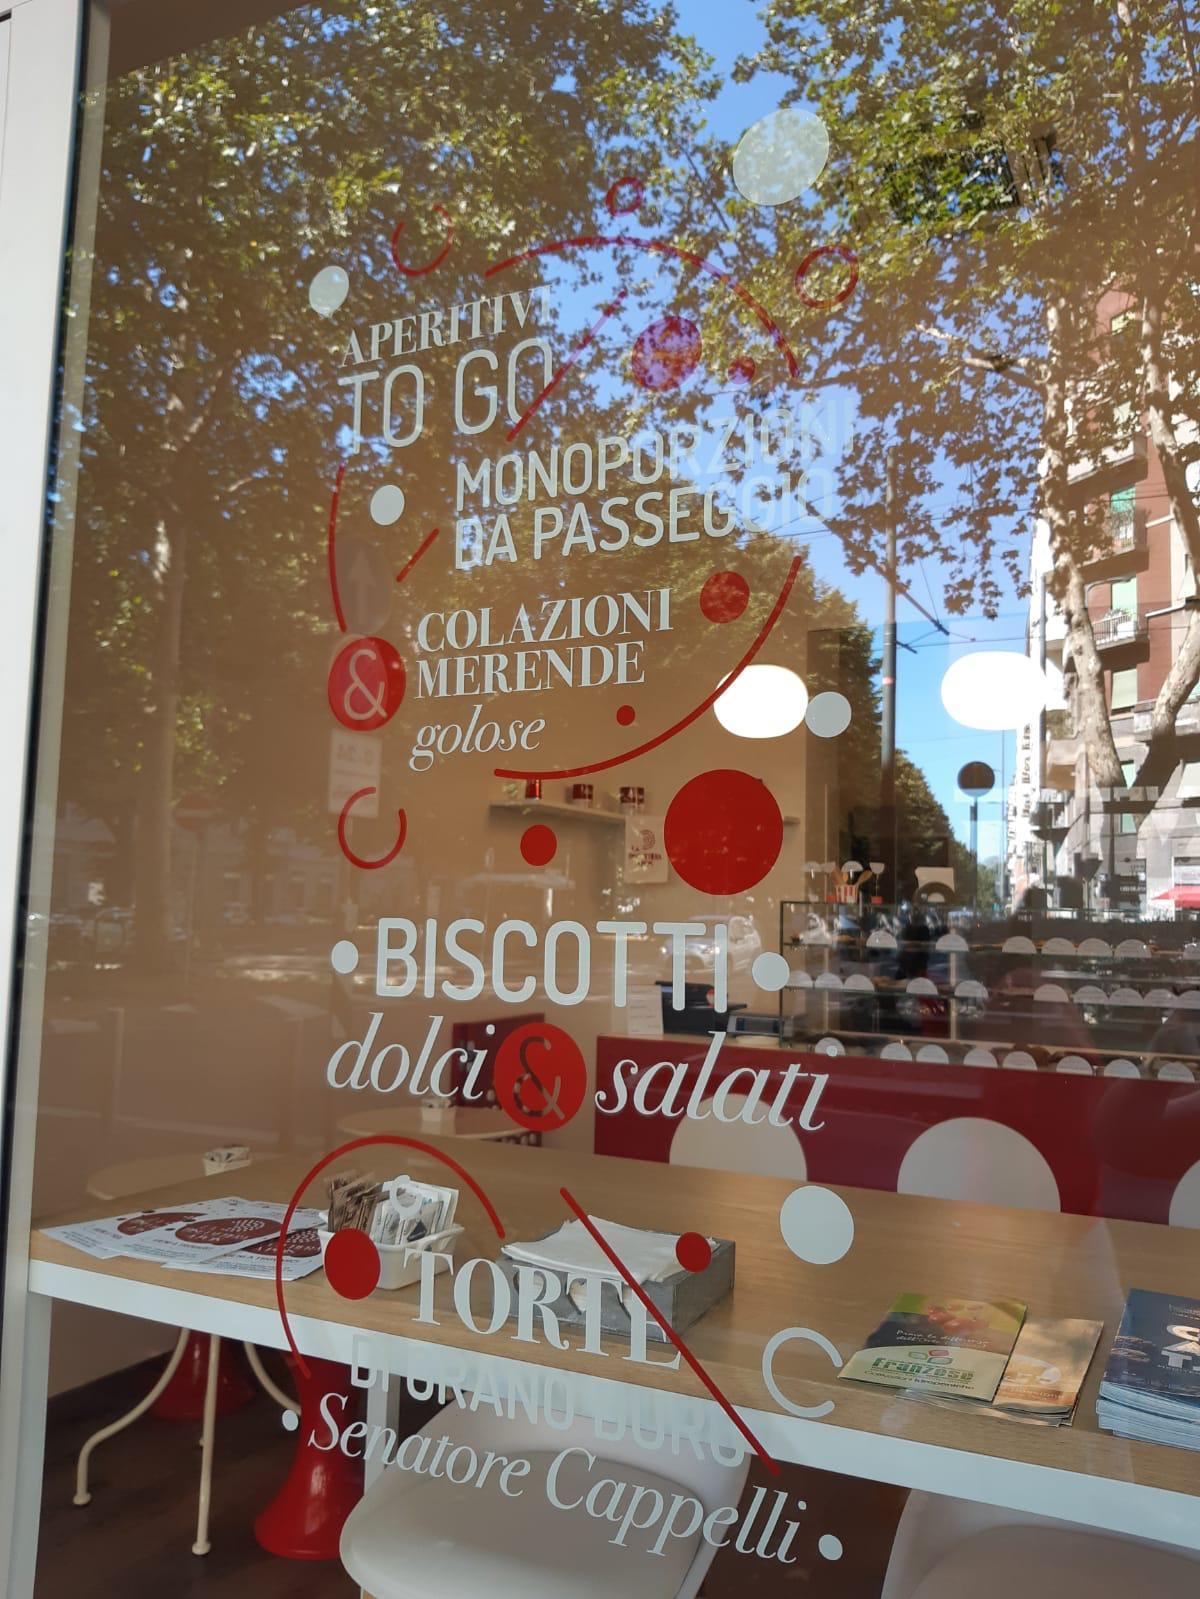 Signage vetrina adesivo biscottiera a pois Milano